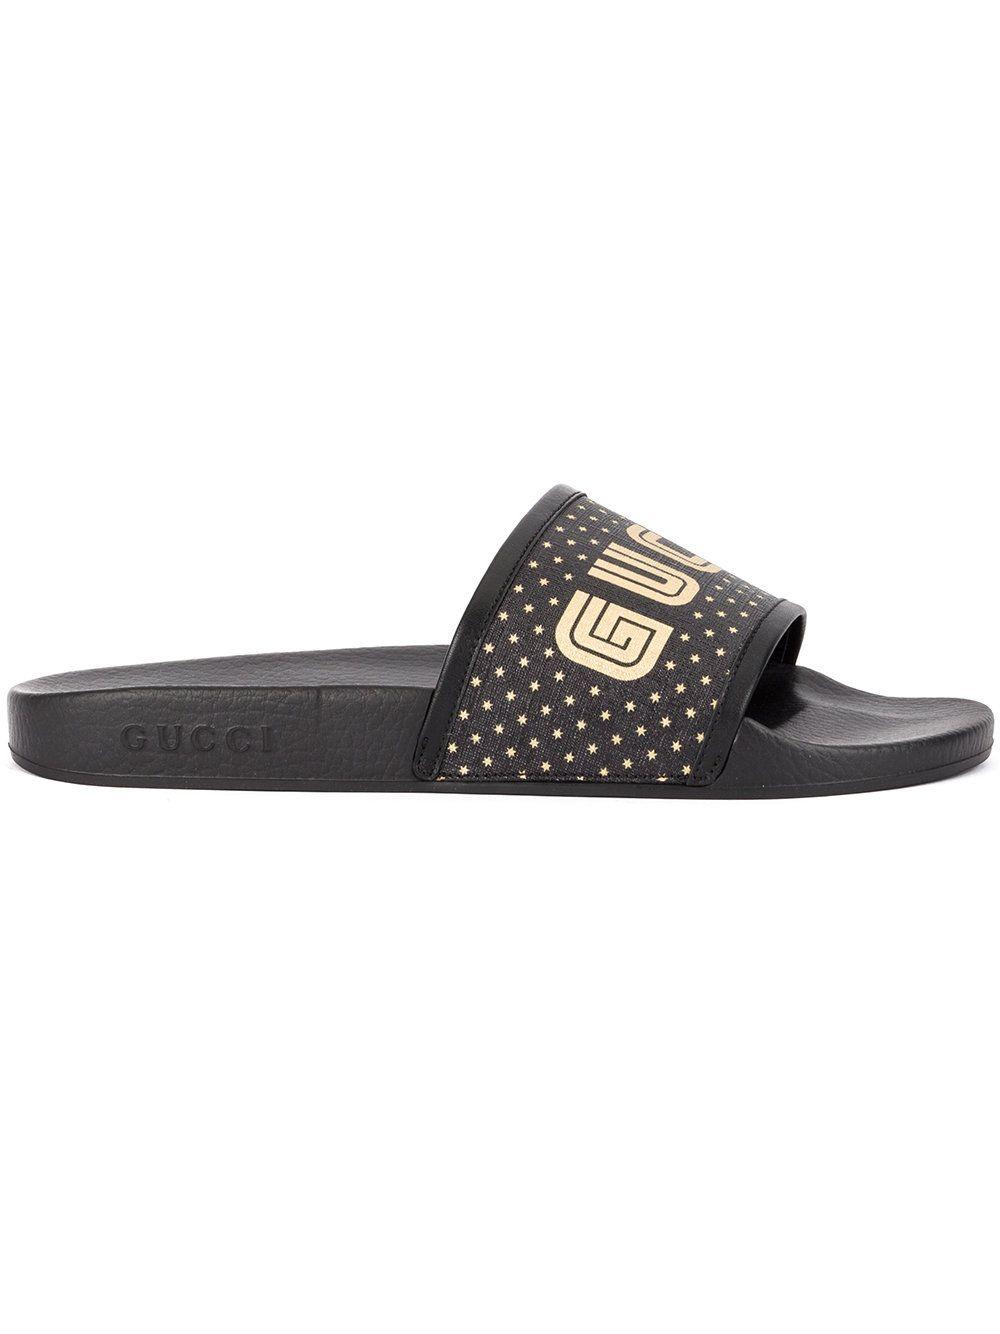 6c799e5e2e7f8 rubber slide sandal gucci mens sandals 308234gib101098 great fit ...